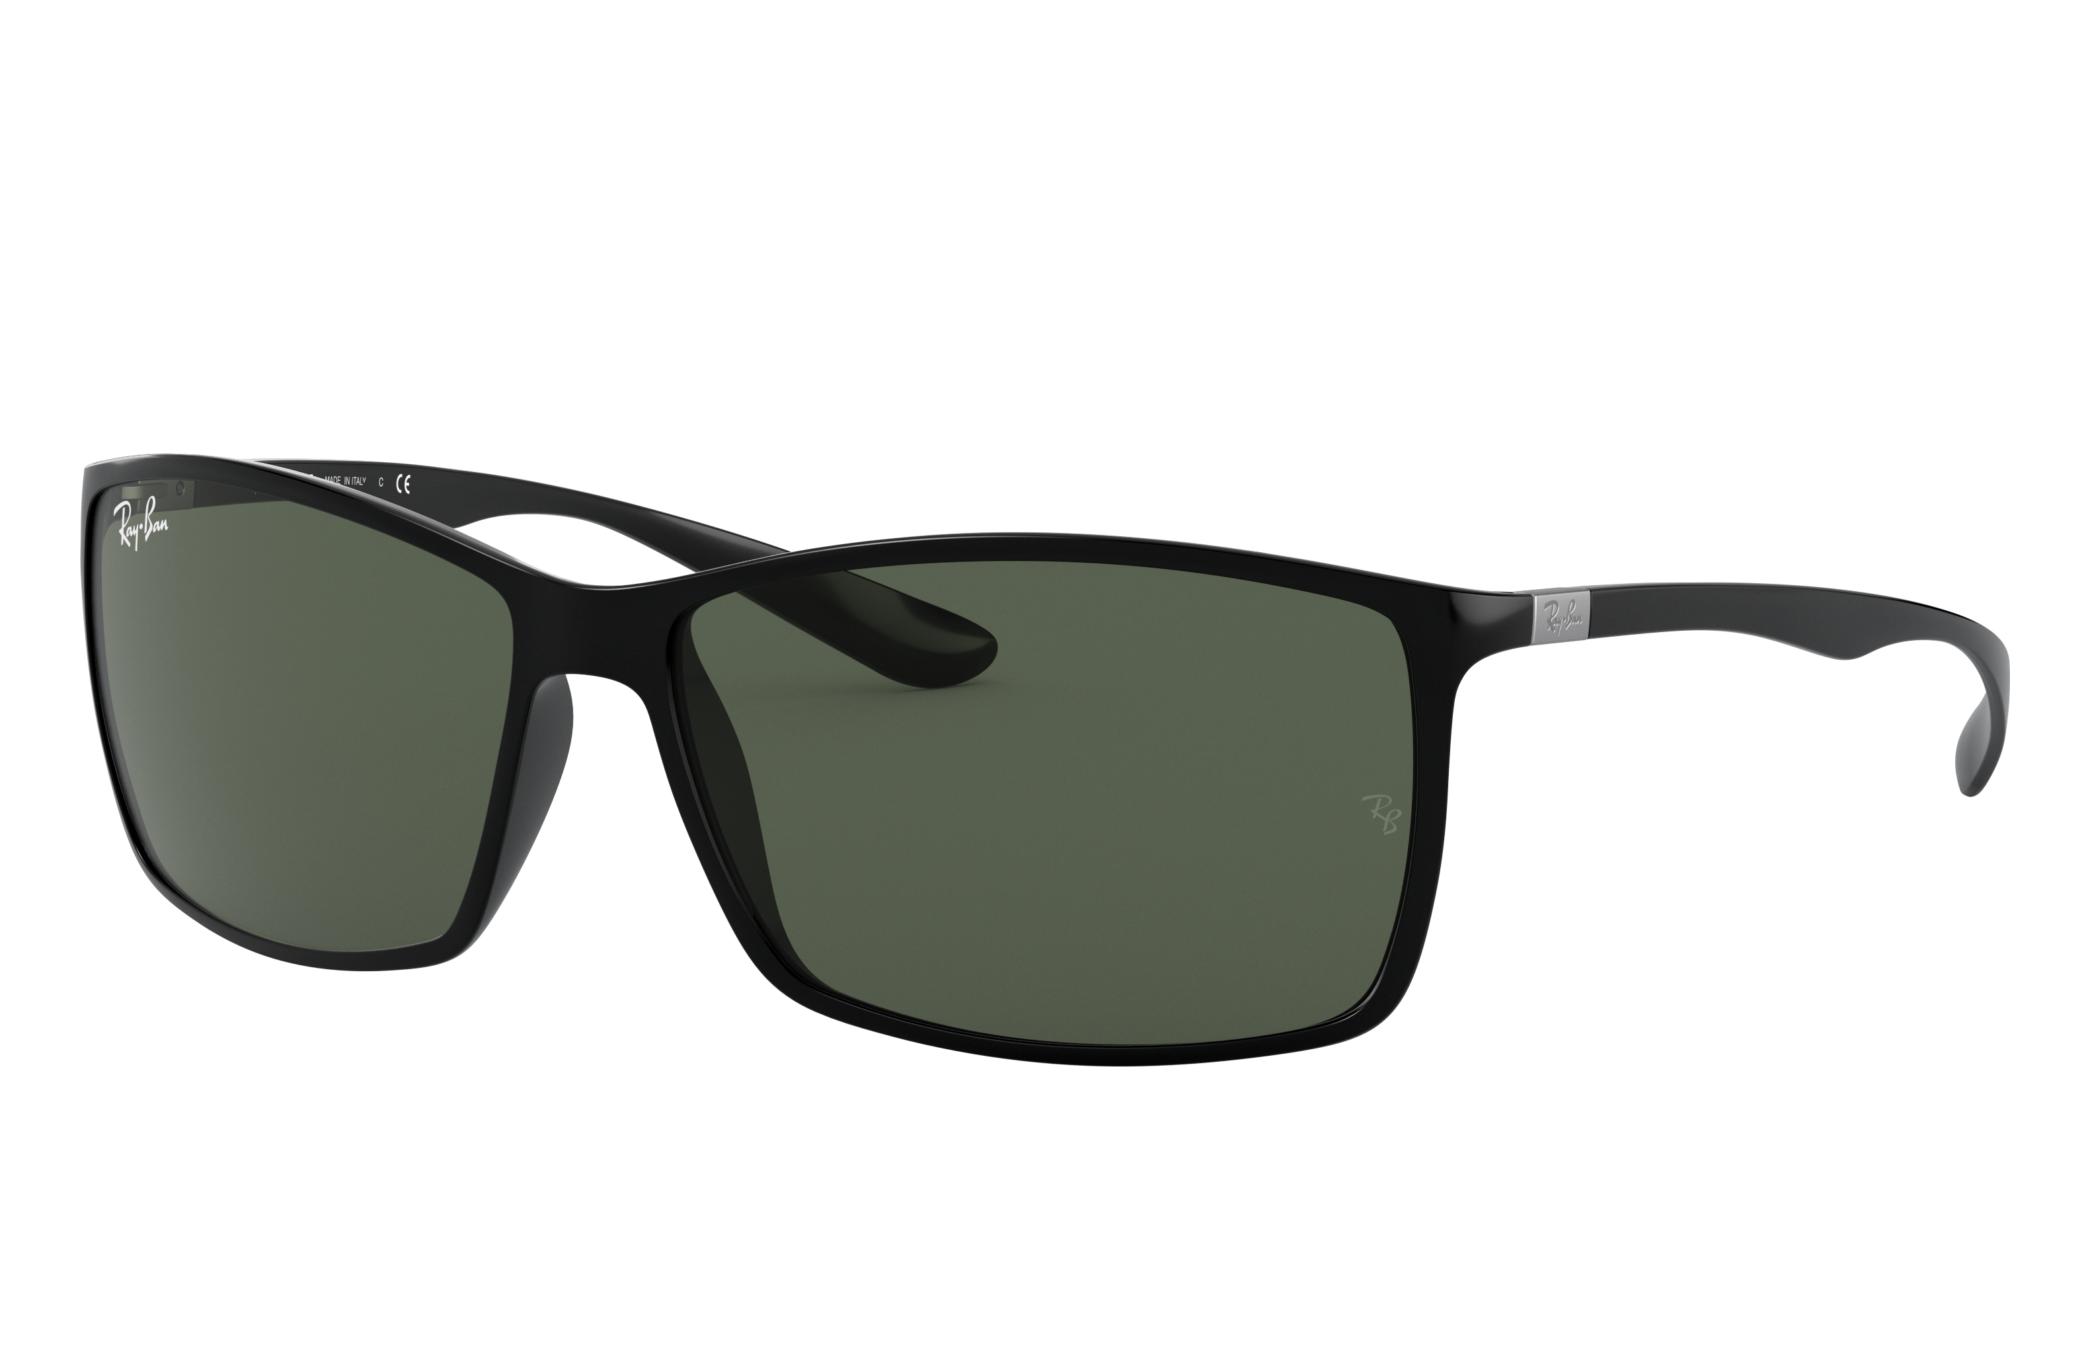 Ray-Ban Rb4179 Black, Green Lenses - RB4179